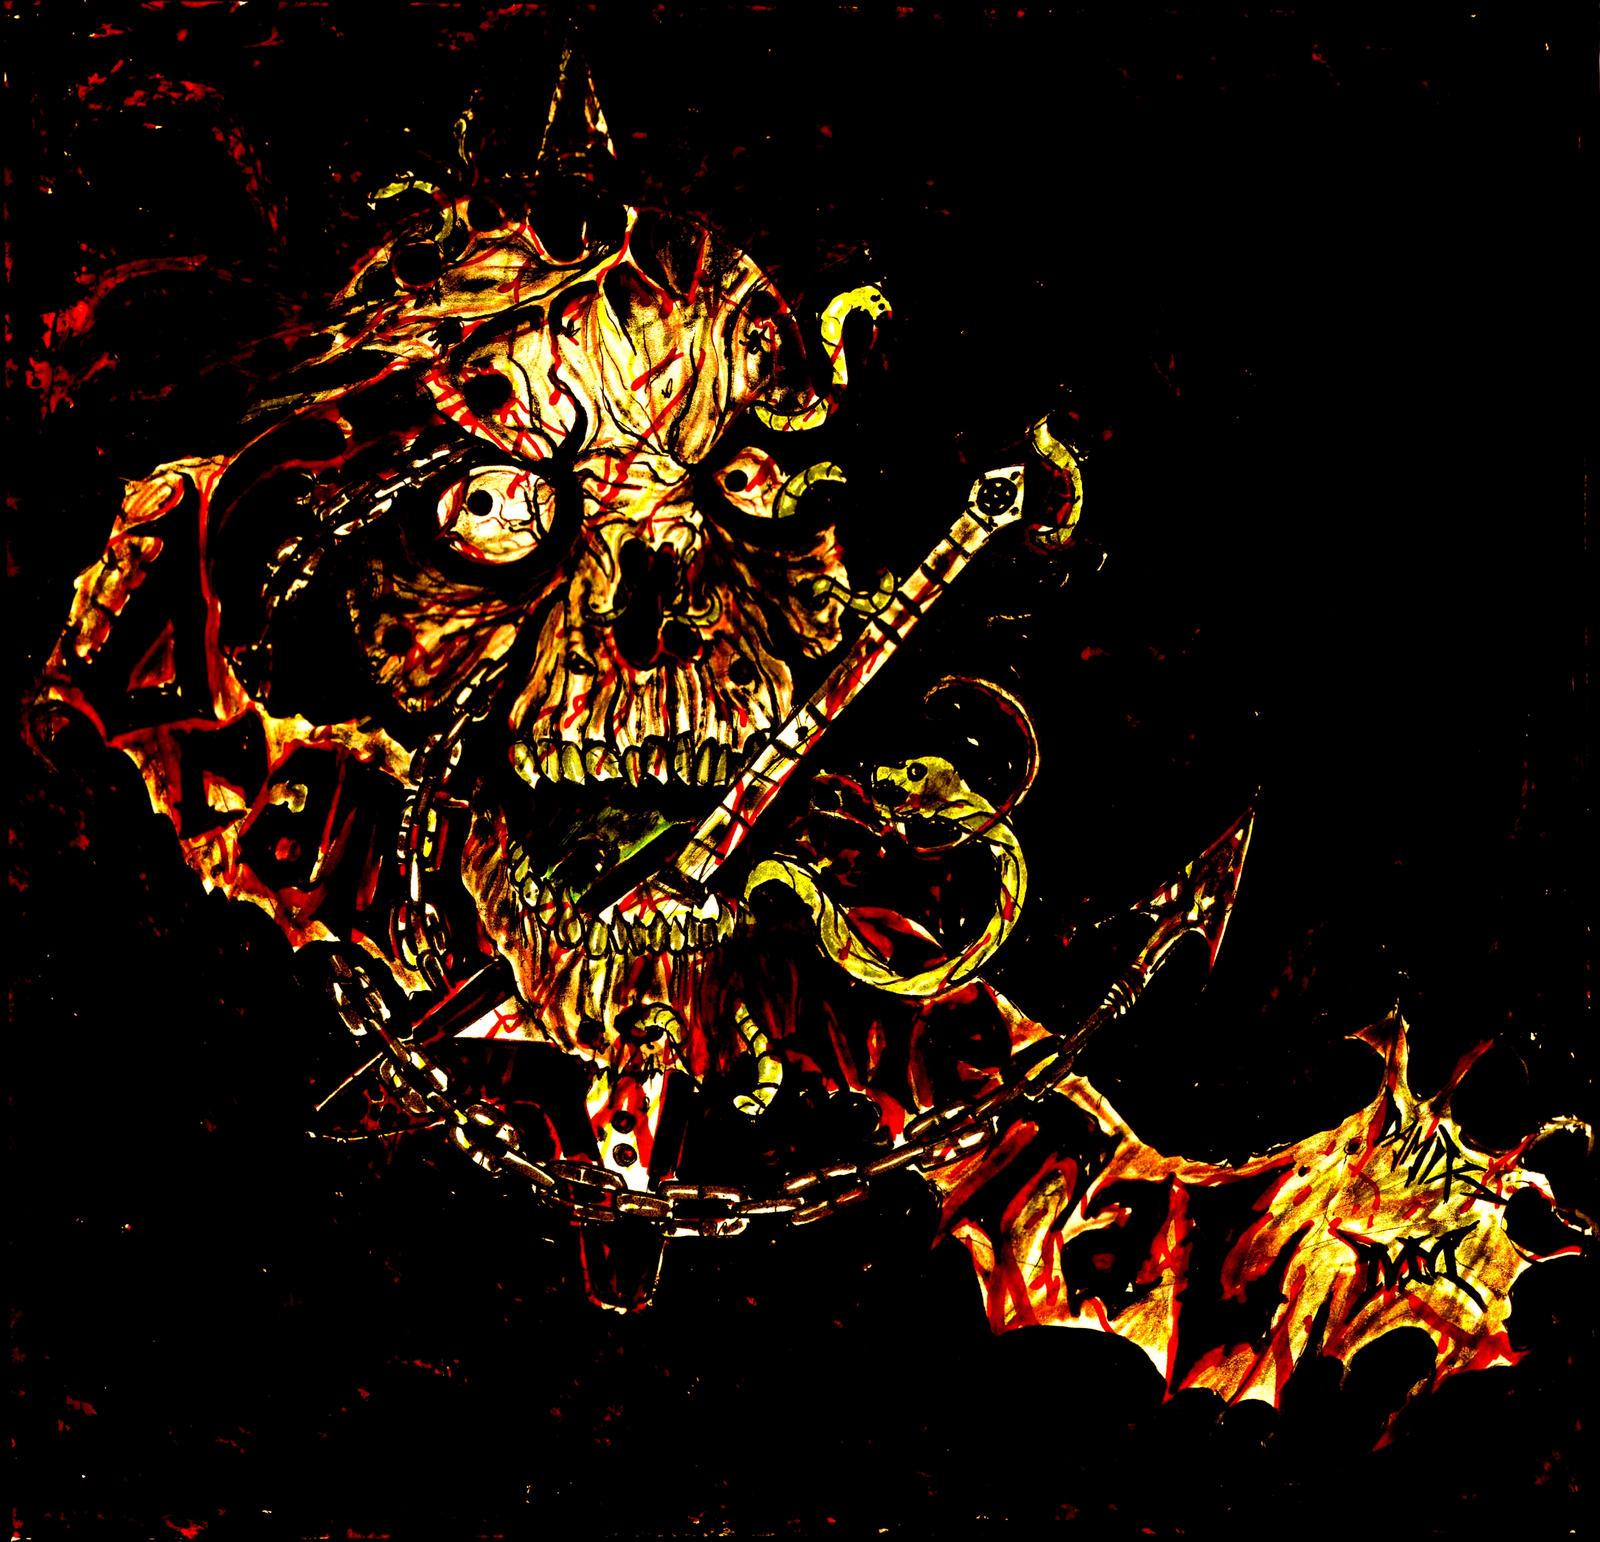 death metal compilation mondometal by damix by damixart